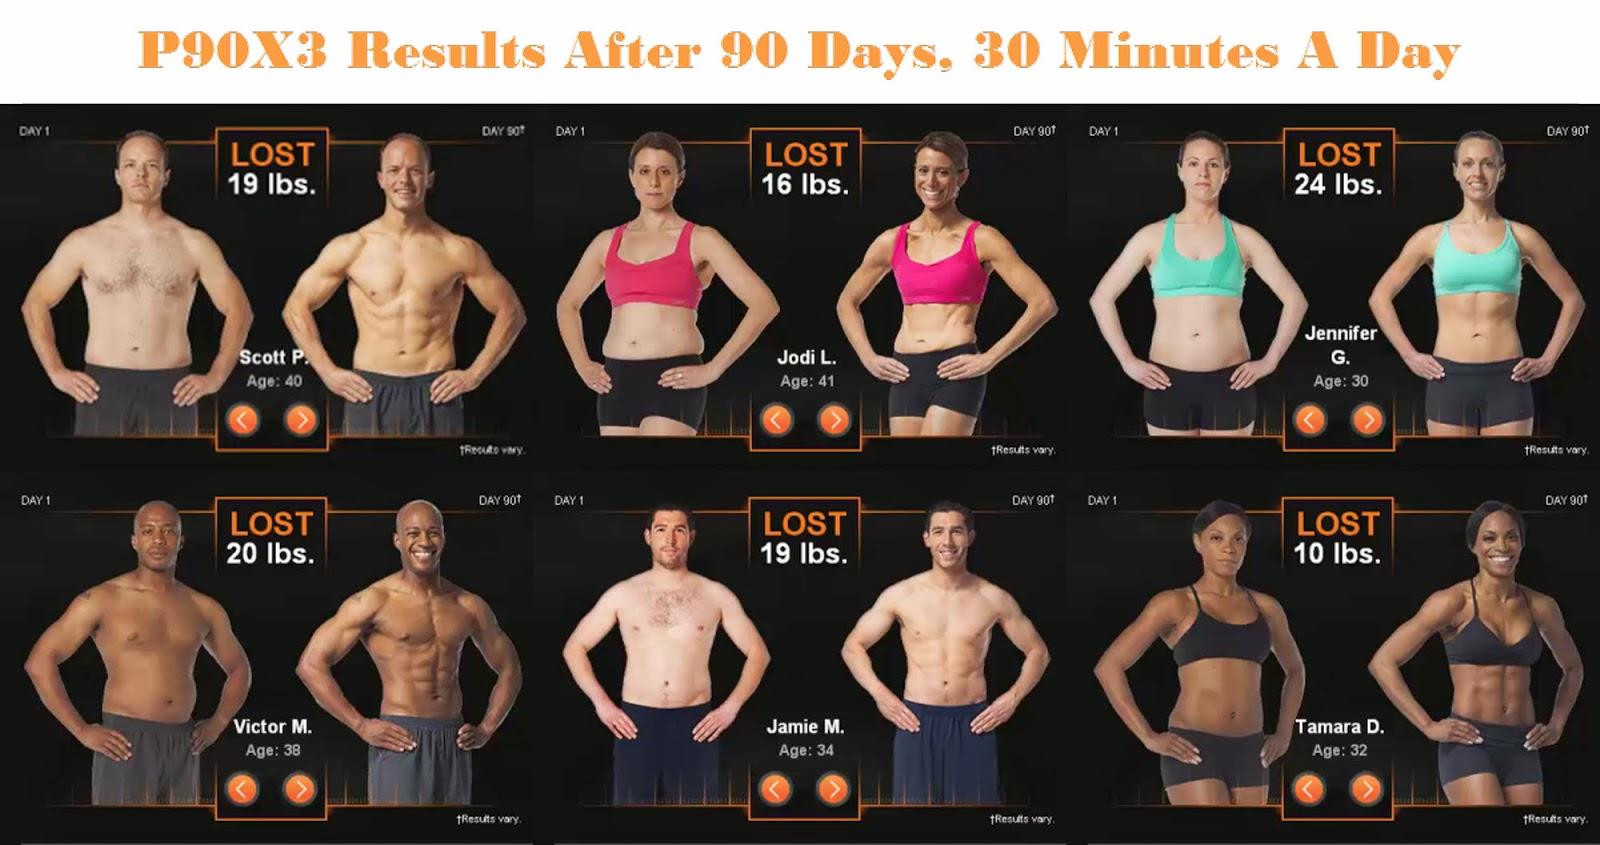 p90x3, details of p90x3, Beachbody workouts, P90x3 transformations, P90x3 workout schedule, what is P90x3, Alyssa schomaker, A fit nurse